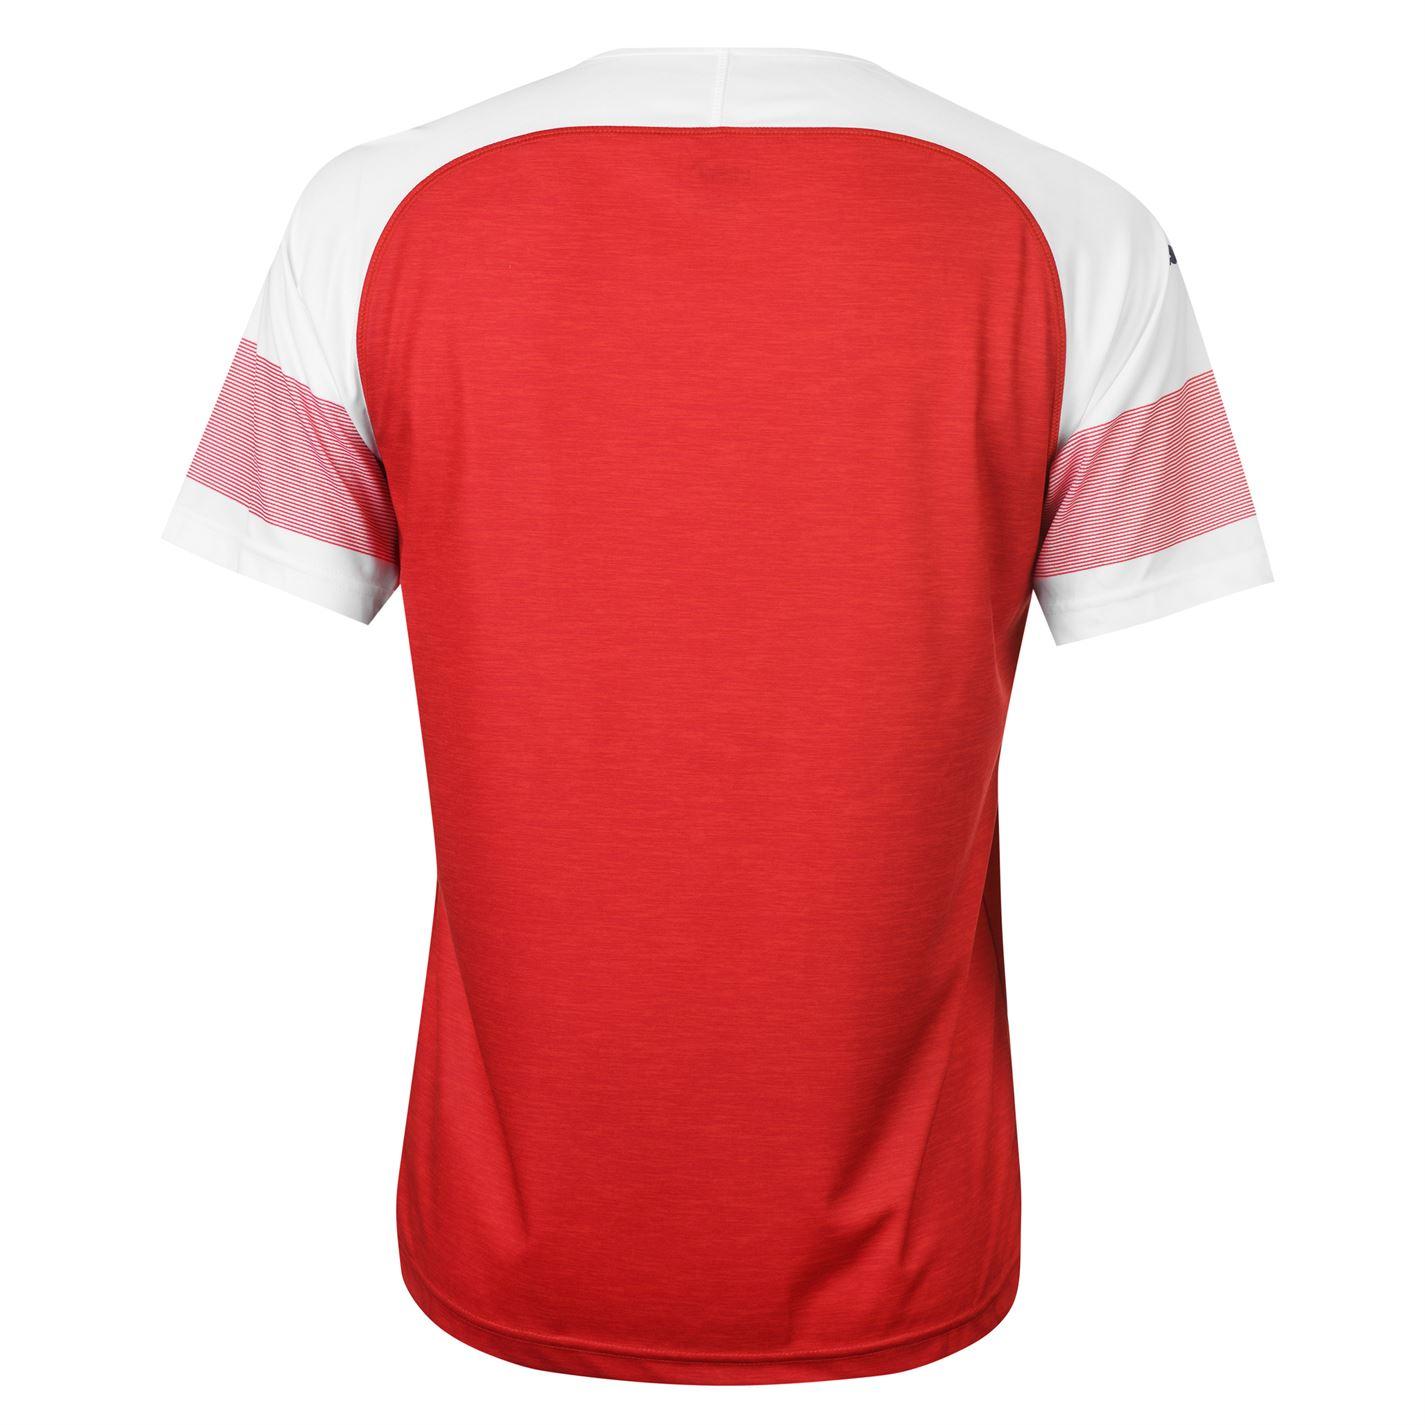 Domestique Shirt Home Blanc Rouge Hommes 2018 V Col Courtes Arsenal Puma 2019 Manches wATq0OxK